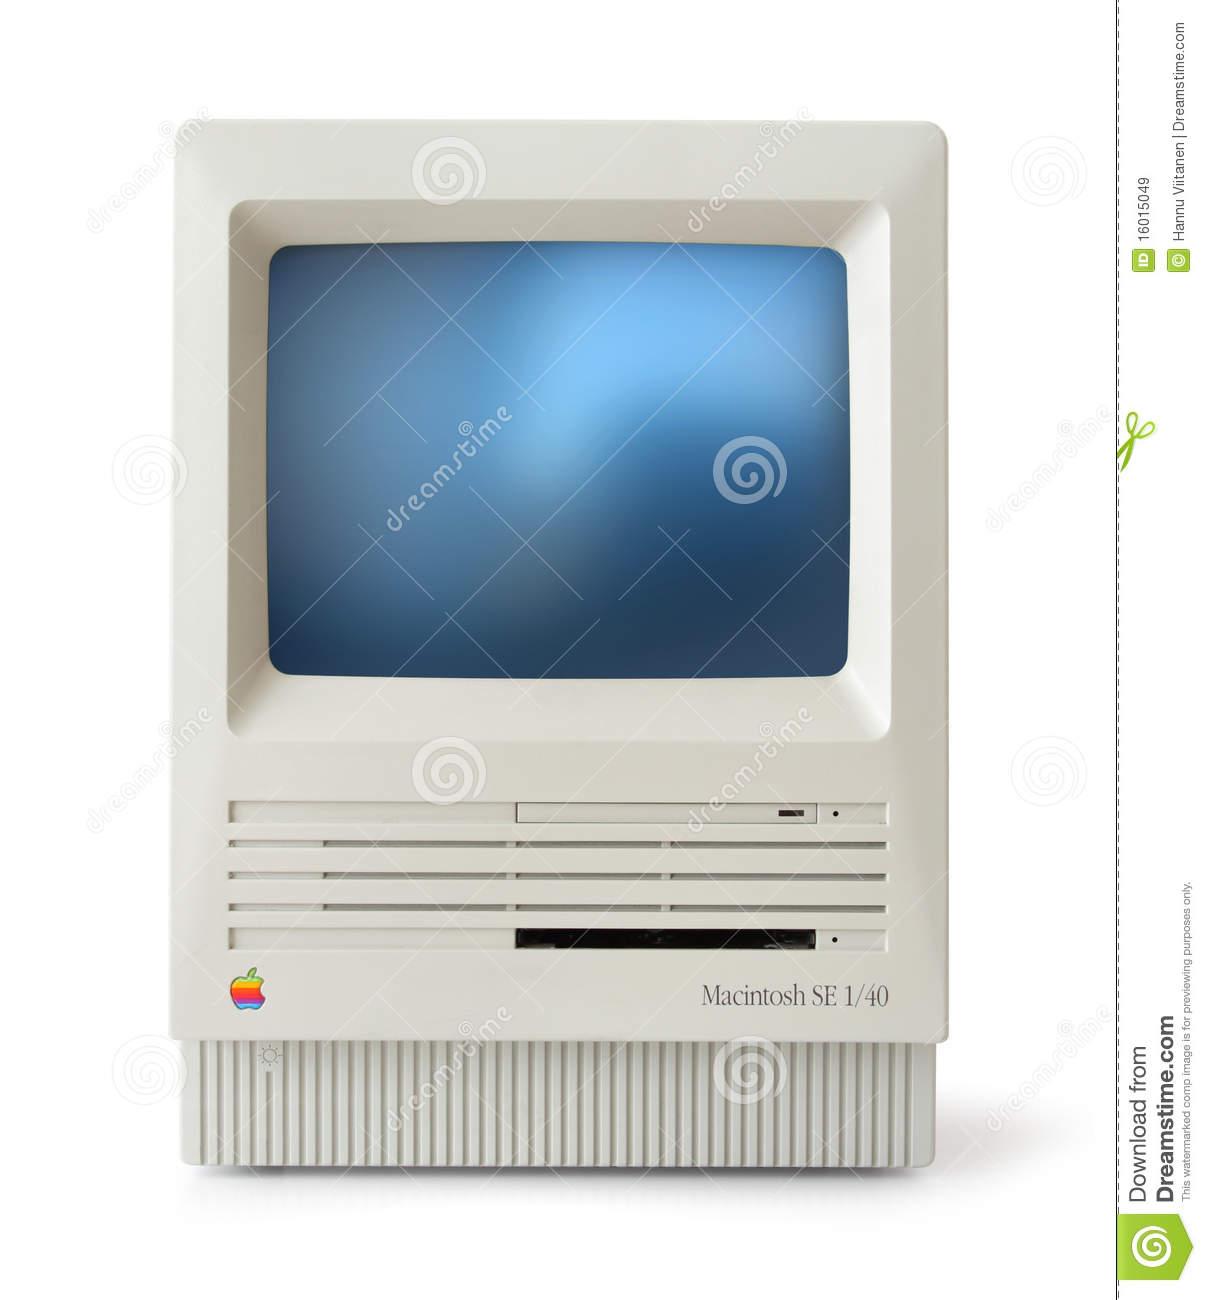 Clip Art Clipart For Mac macintosh clipart kid classic mac se front editorial stock image 16015049